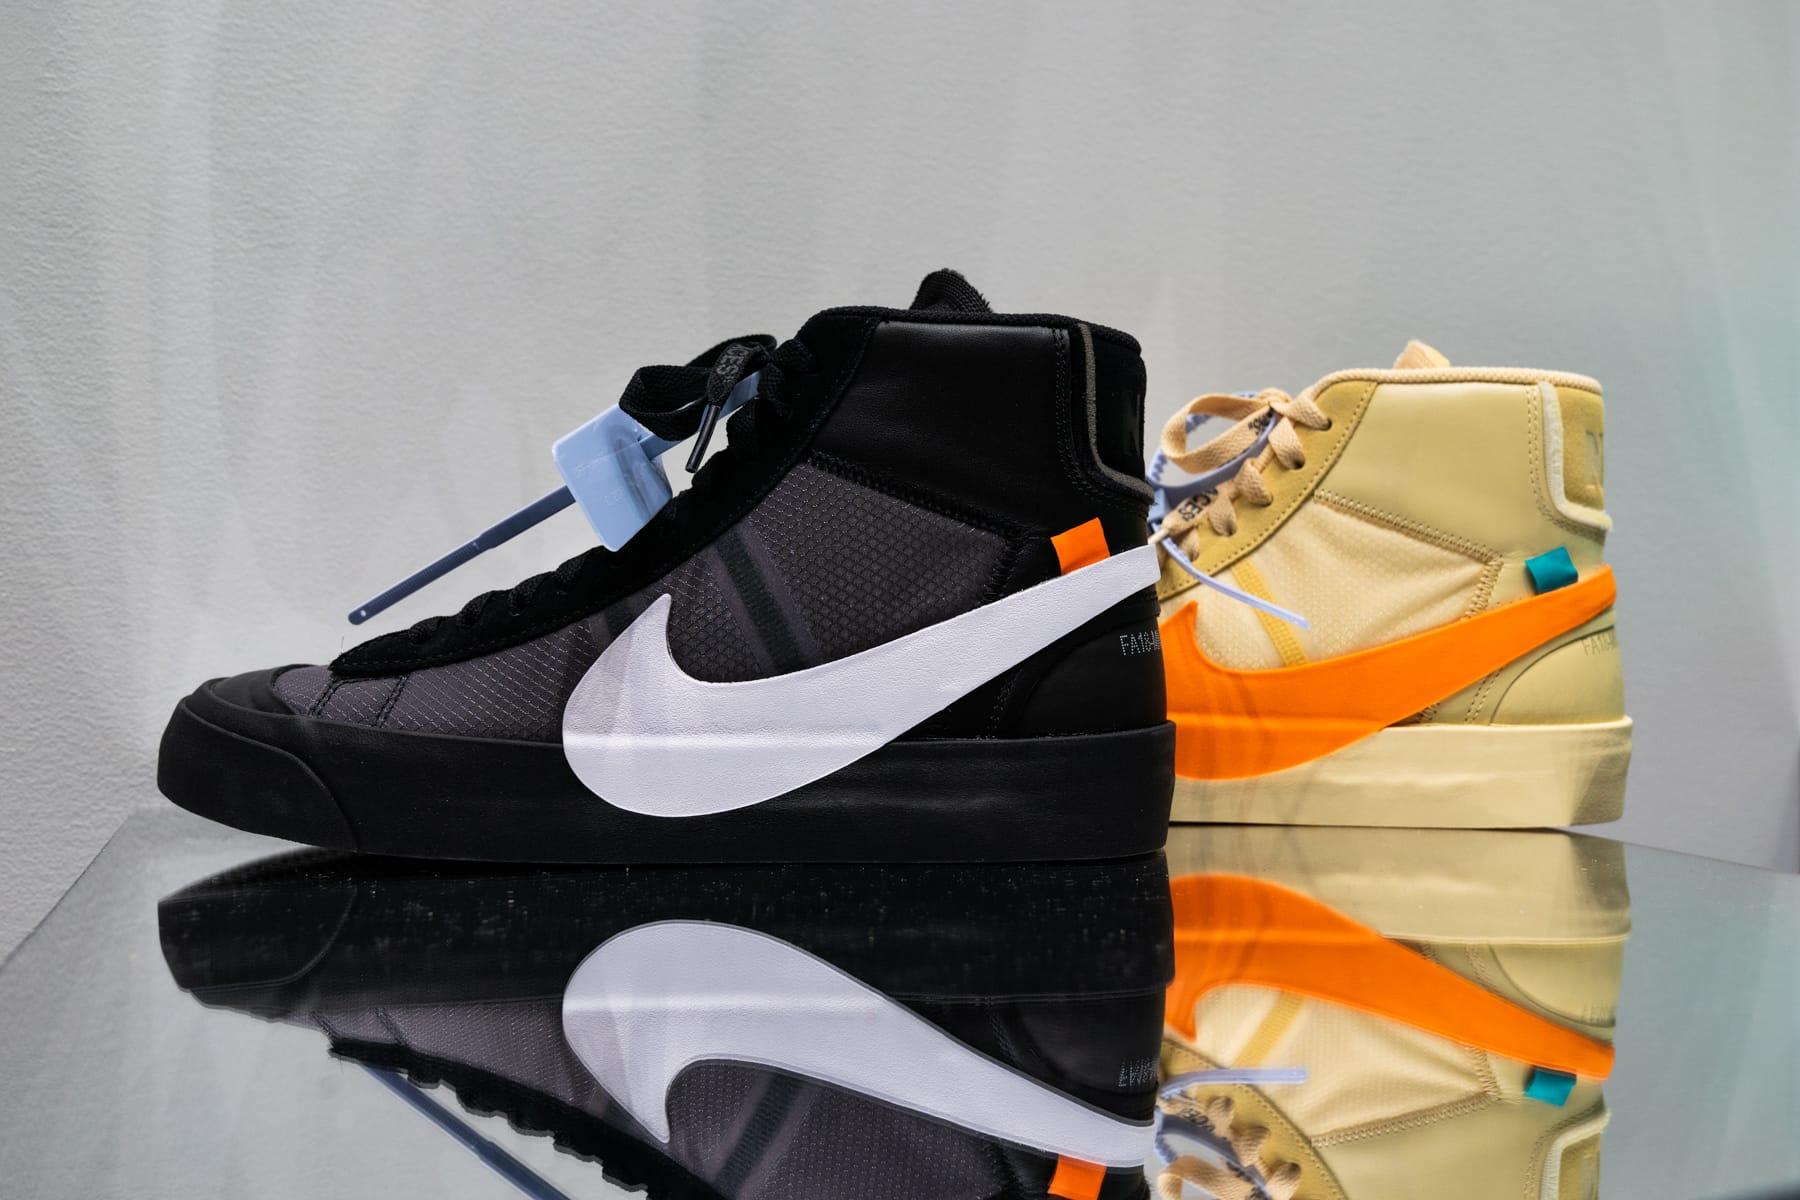 Off-White x Nike Blazer Spooky Pack